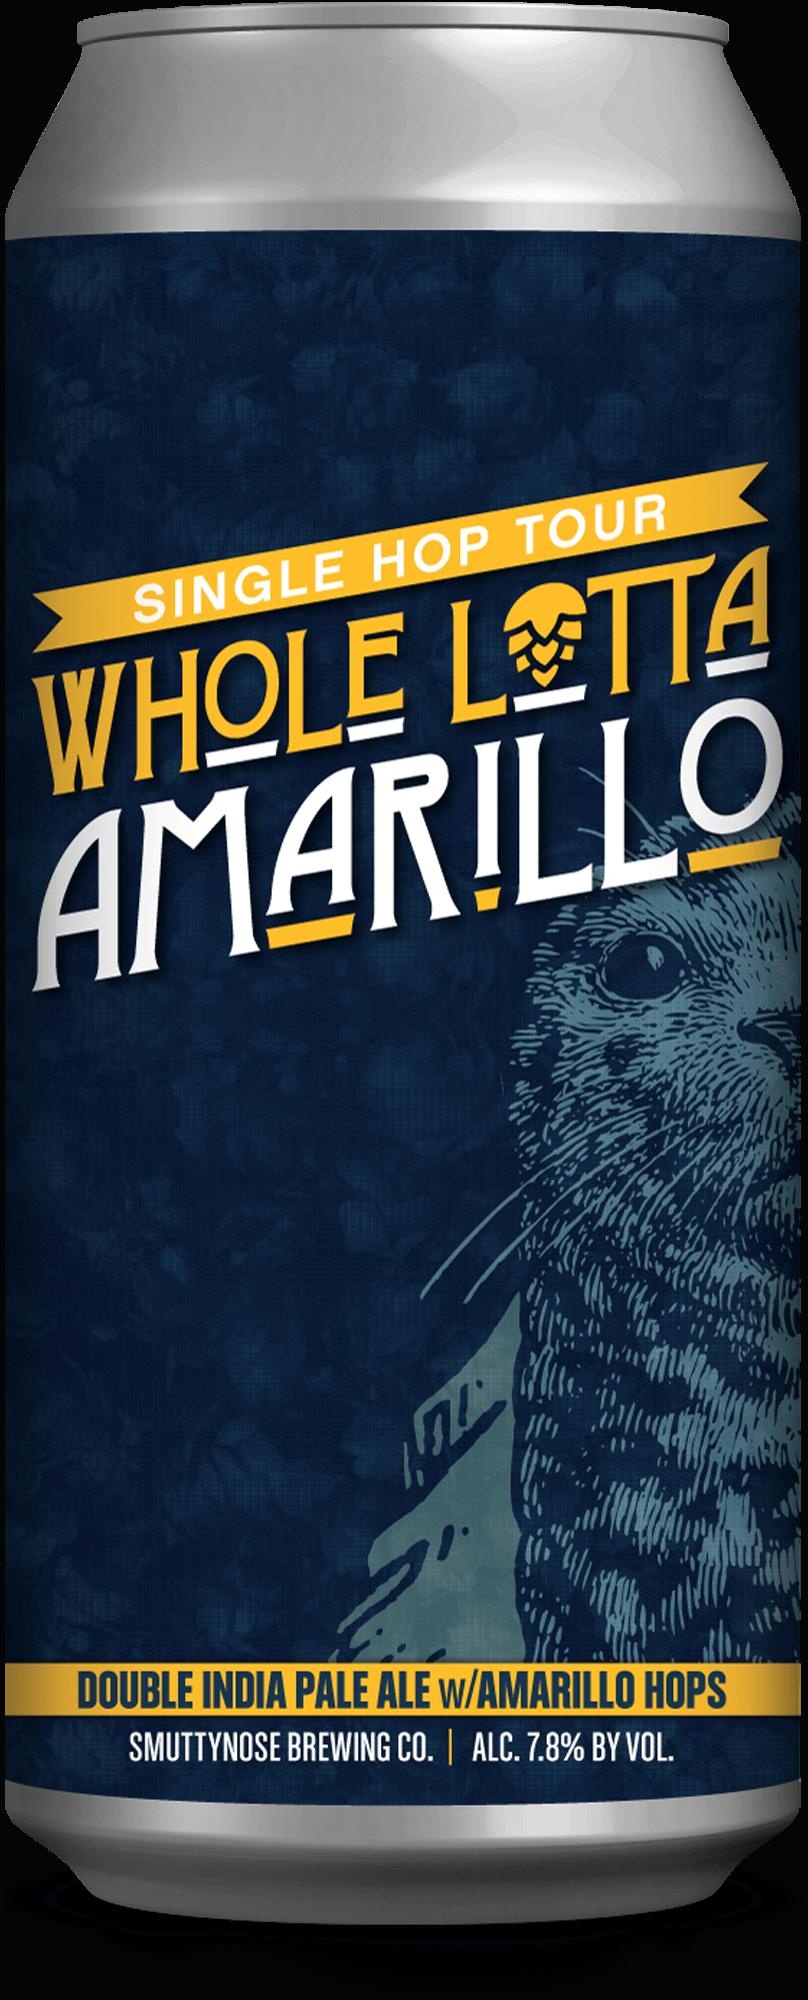 WHOLE LOTTA AMARILLO